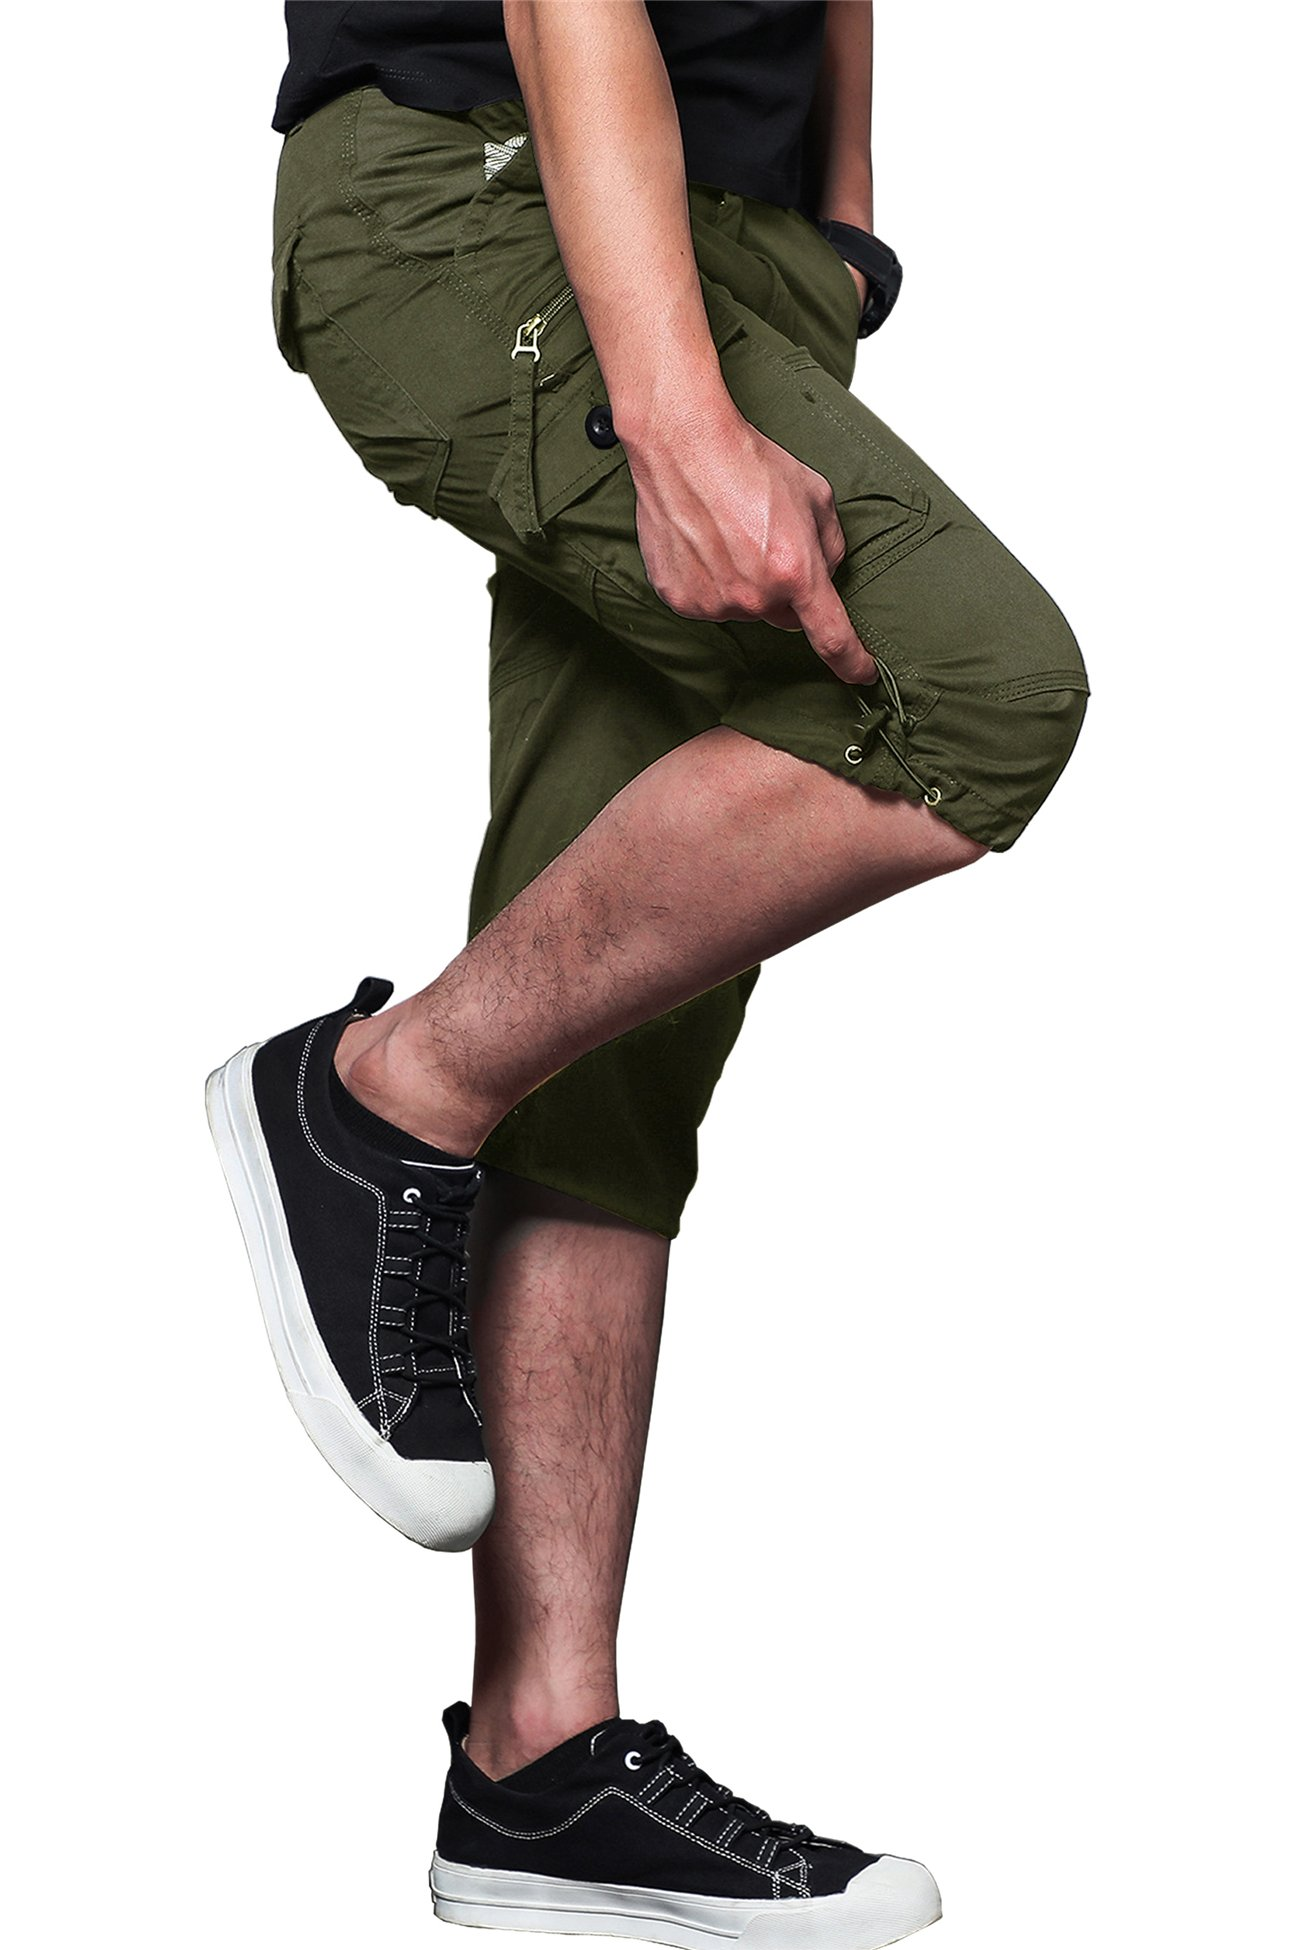 MAKEIIT Men's Juniors Cargo Shorts XXXL Cargo Shorts Dri Fit Cargo Shorts with Multi-Pocket by MAKEIIT (Image #2)